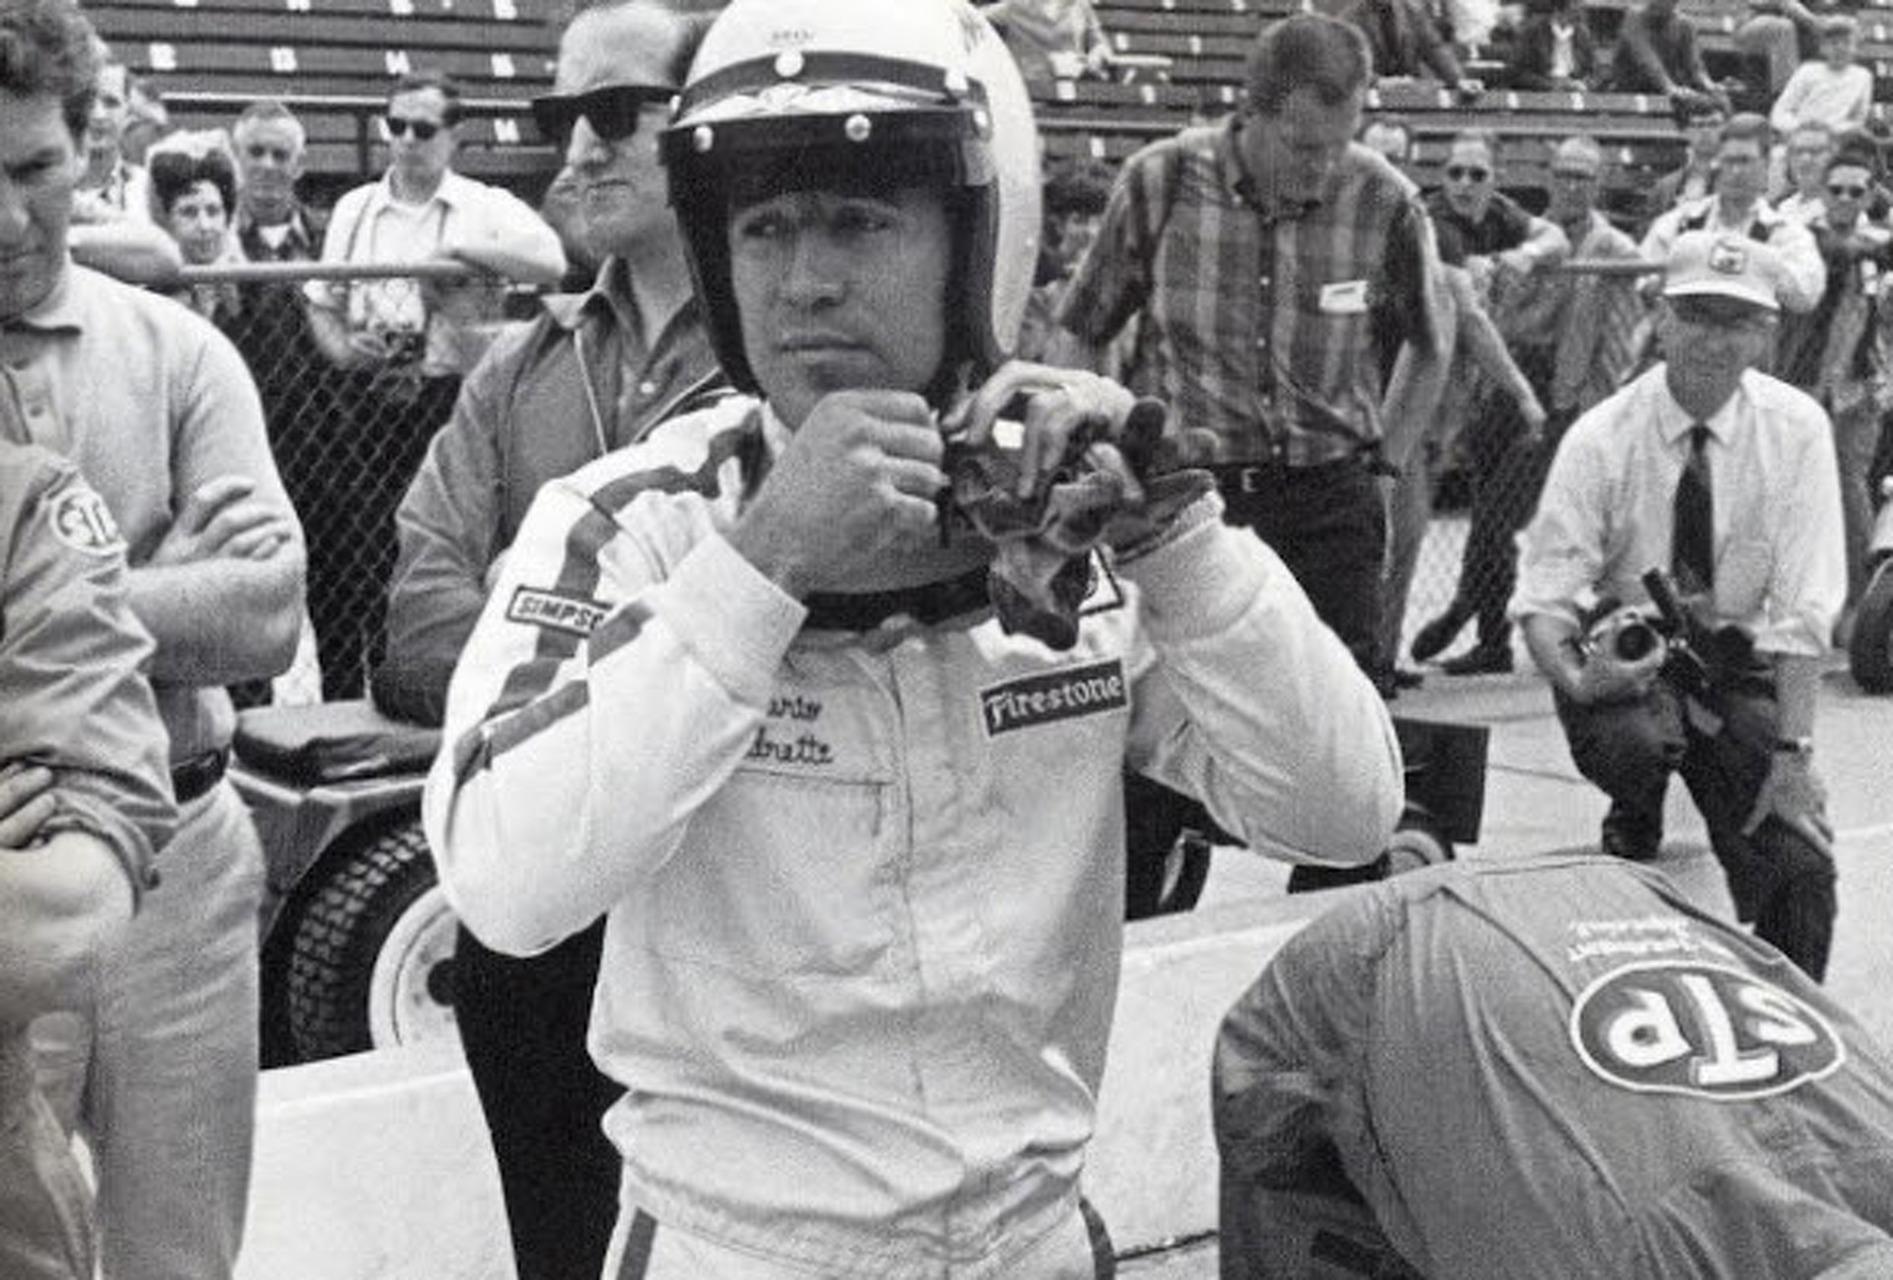 Andretti, Gross, Iacocca and Leno: 4 Great Auto Ambassadors